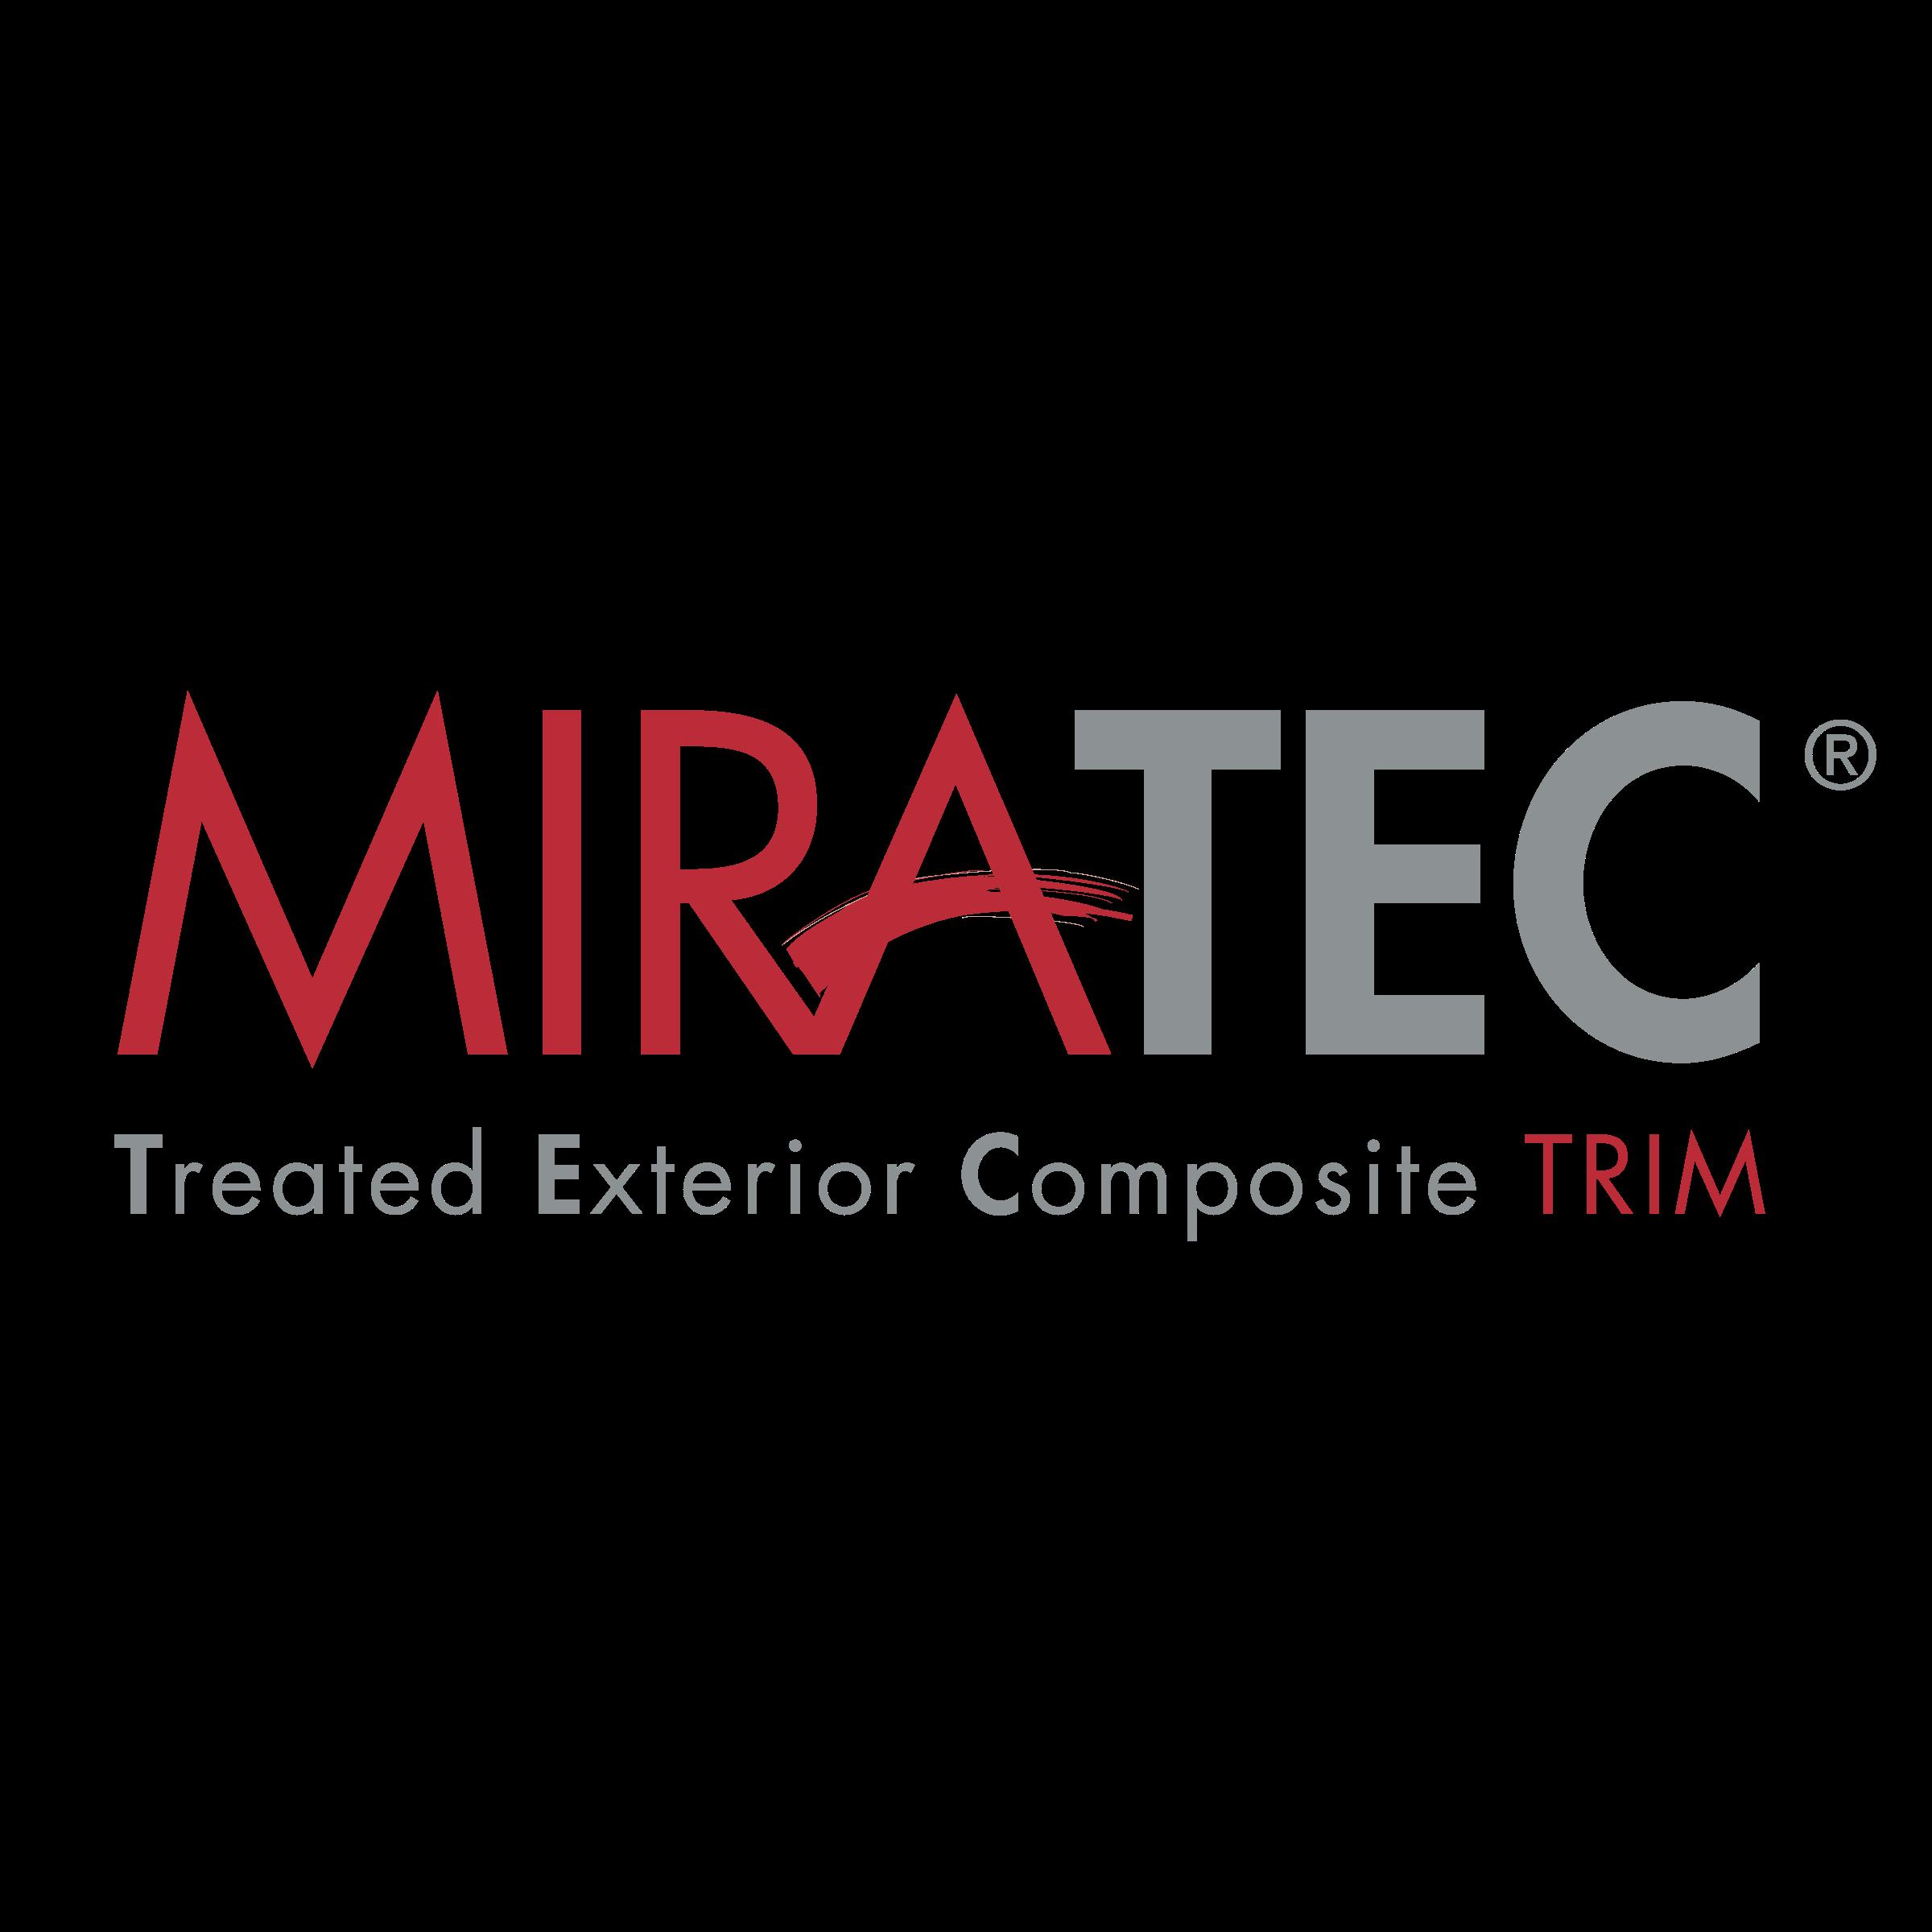 miratec-logo-png-transparent.png